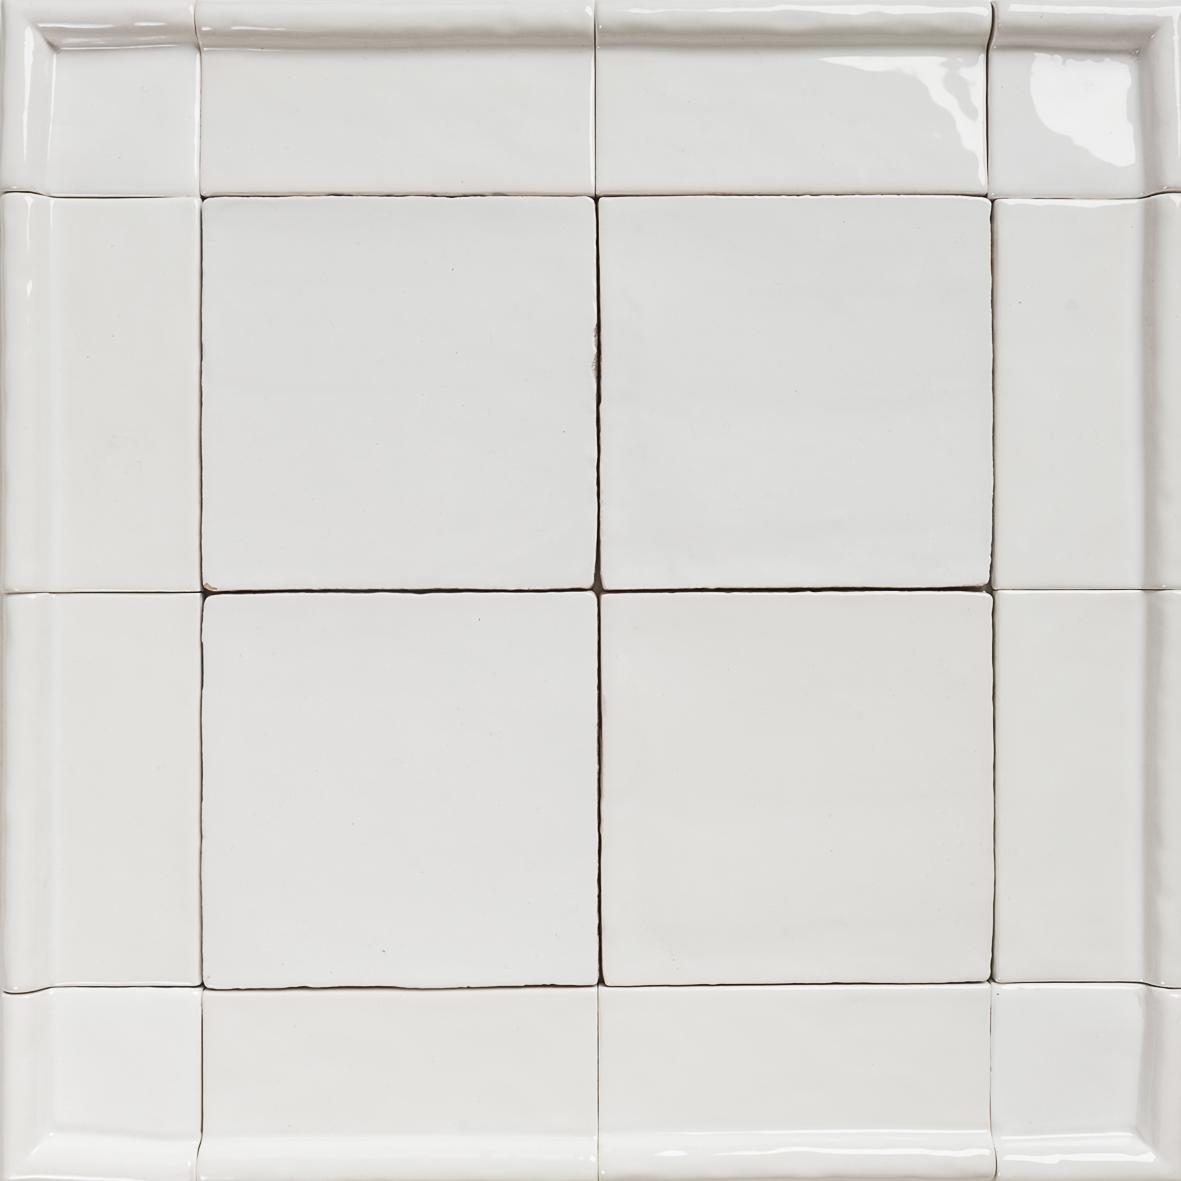 Handmade Natura White Gloss Tiles With Border Eco Tile